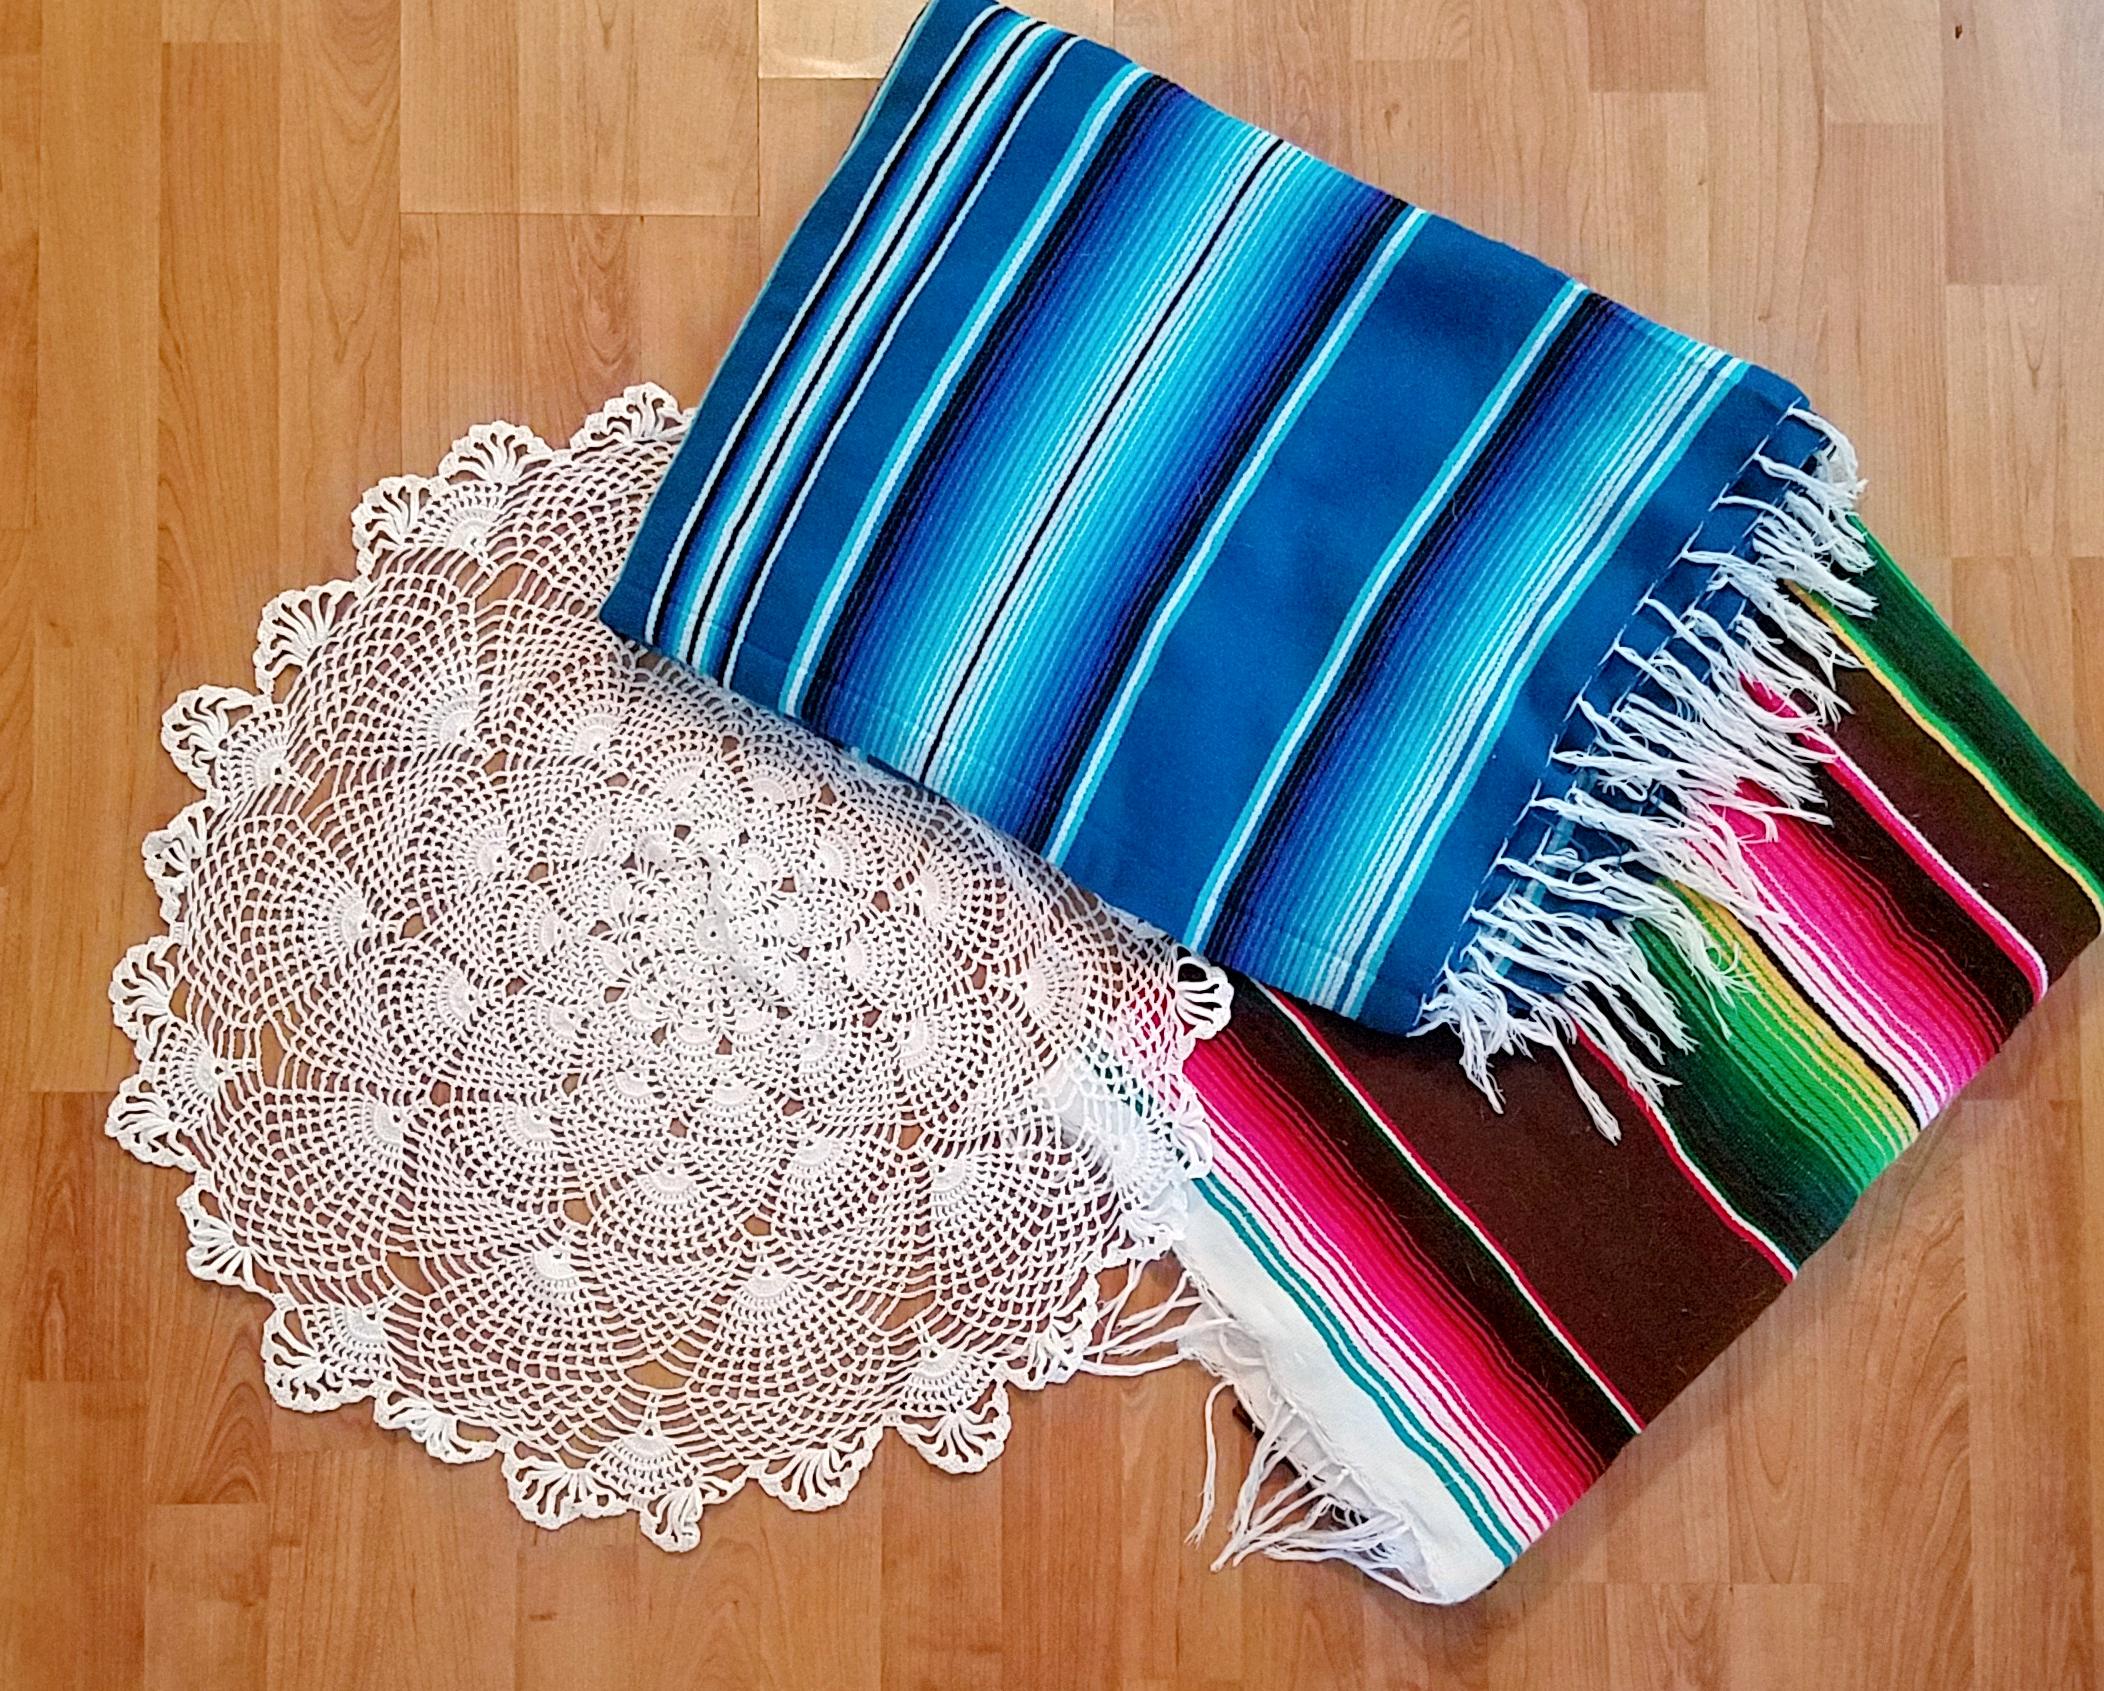 homedecor.travel.textiles.